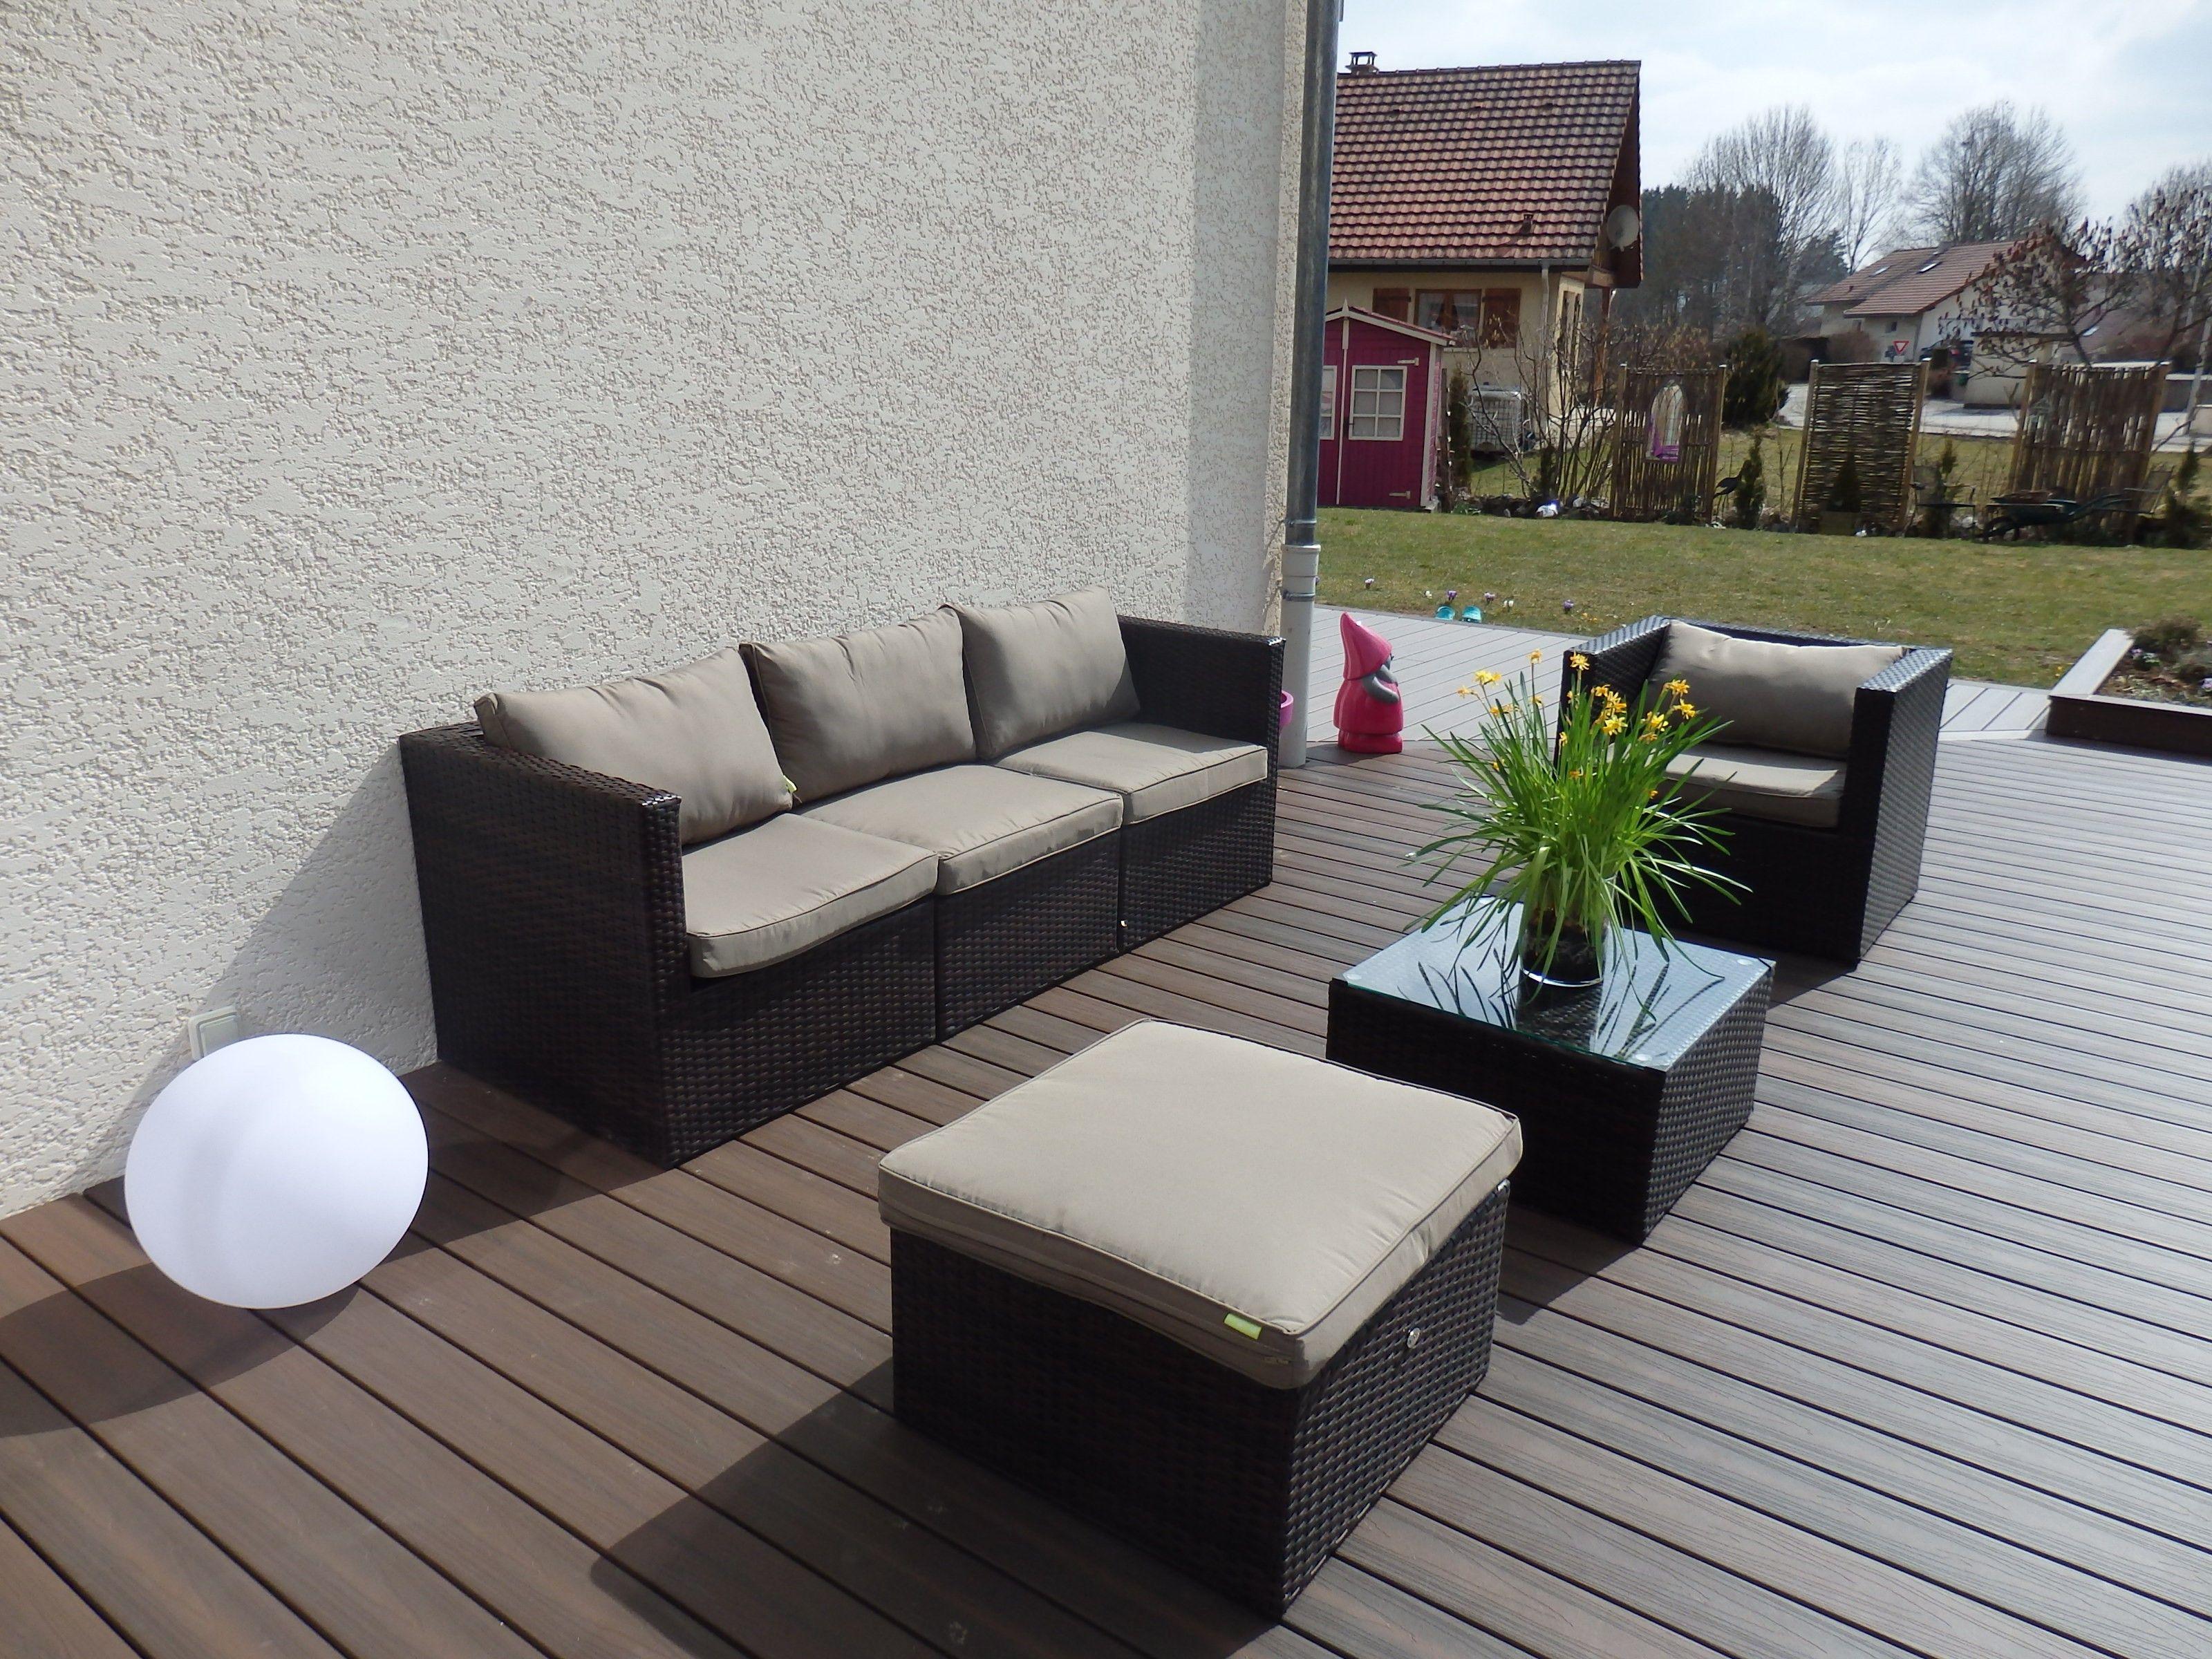 inspirant salon de jardin aluminium et resine tressee | Décoration ...